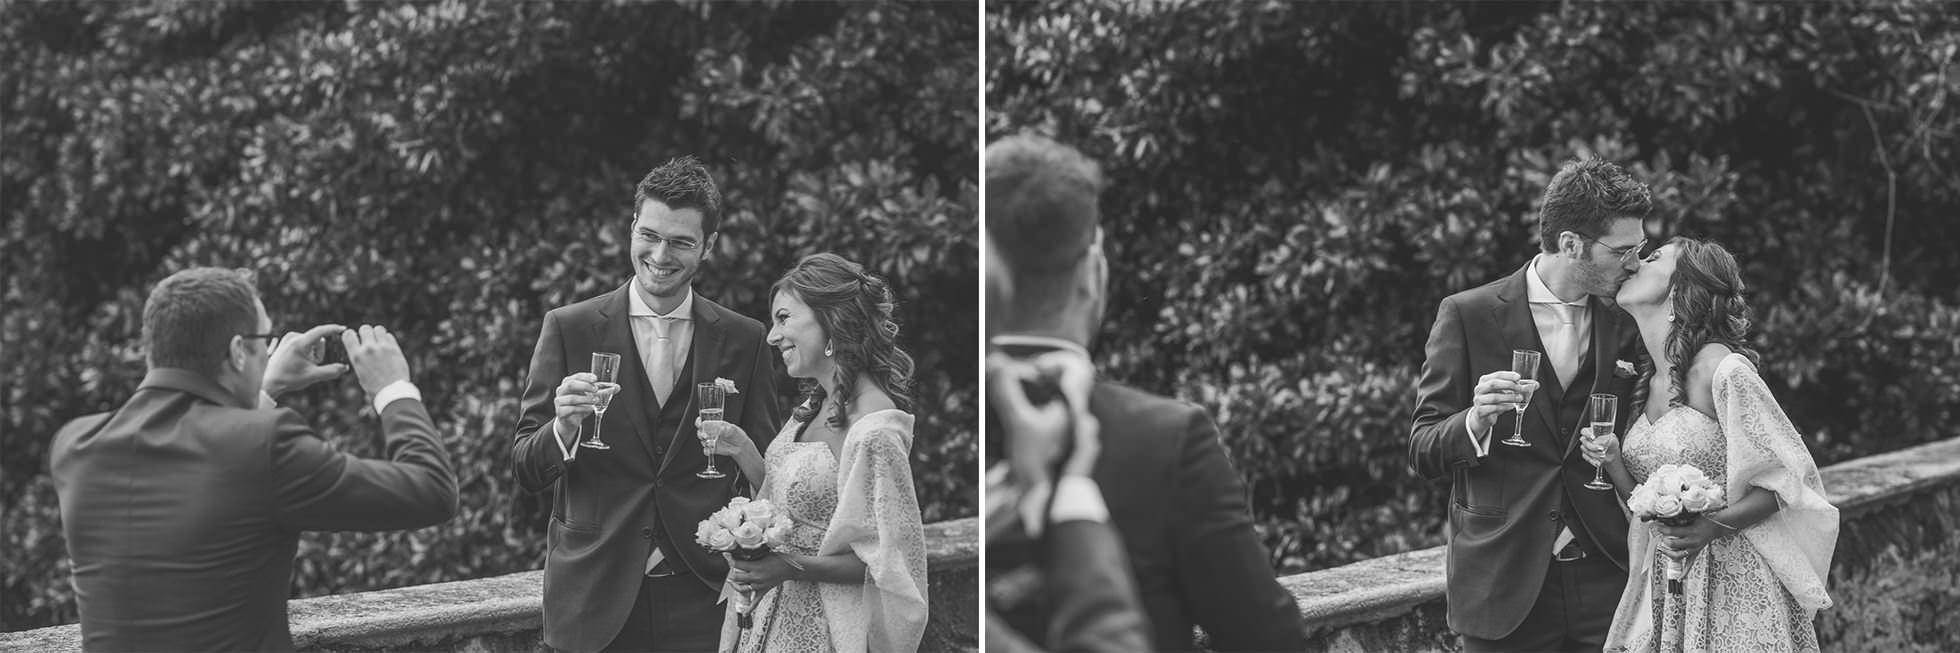 Fotografo matrimonio palazzo gallio